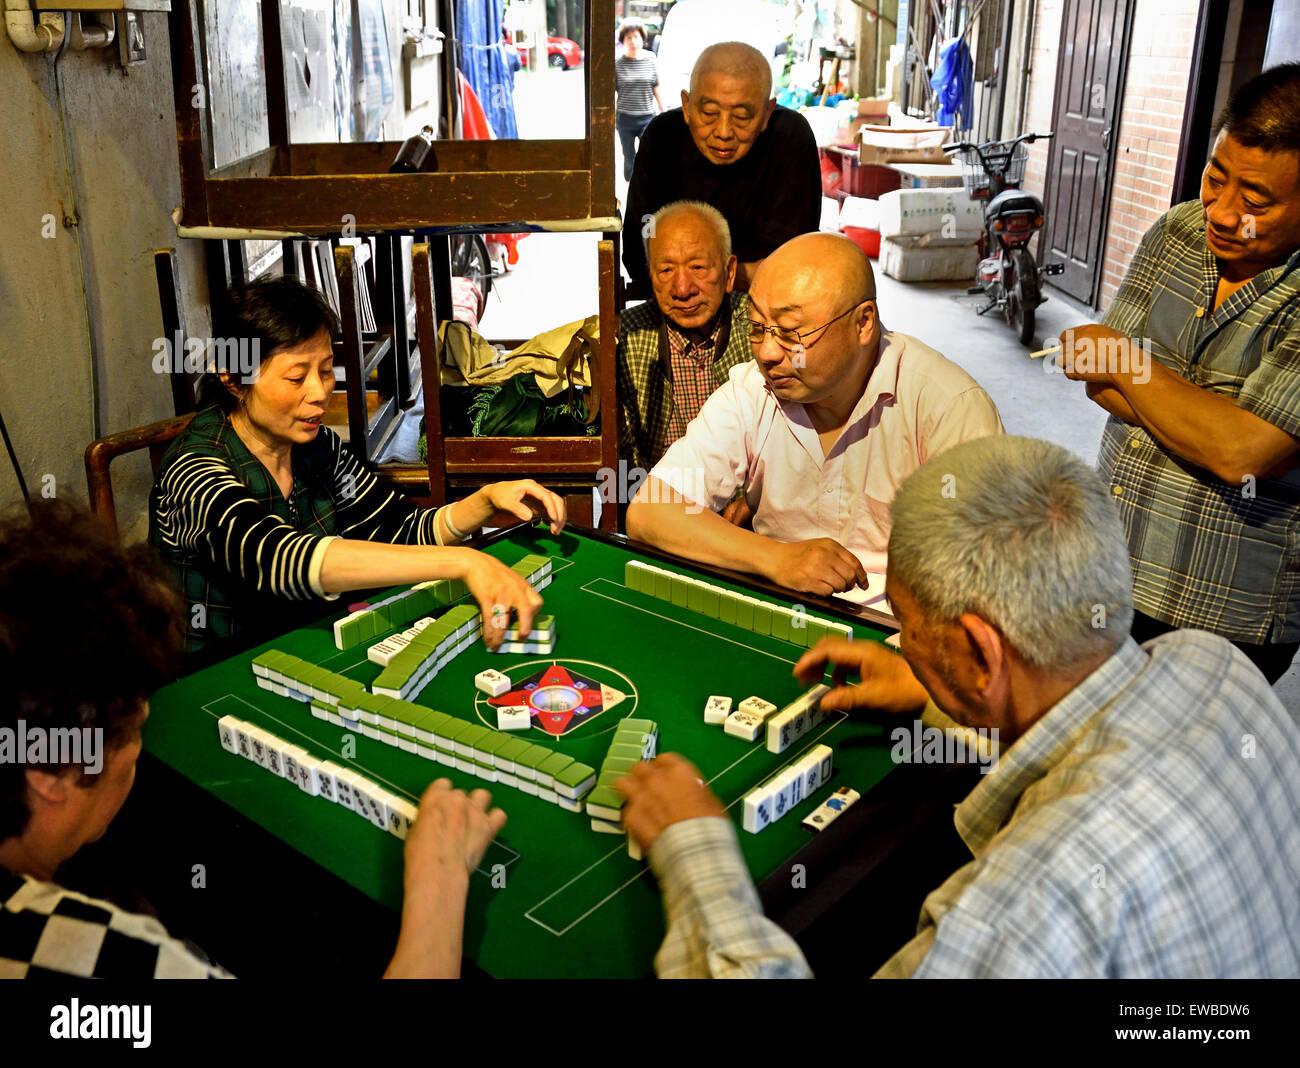 Shanghai gambling articles on casinos